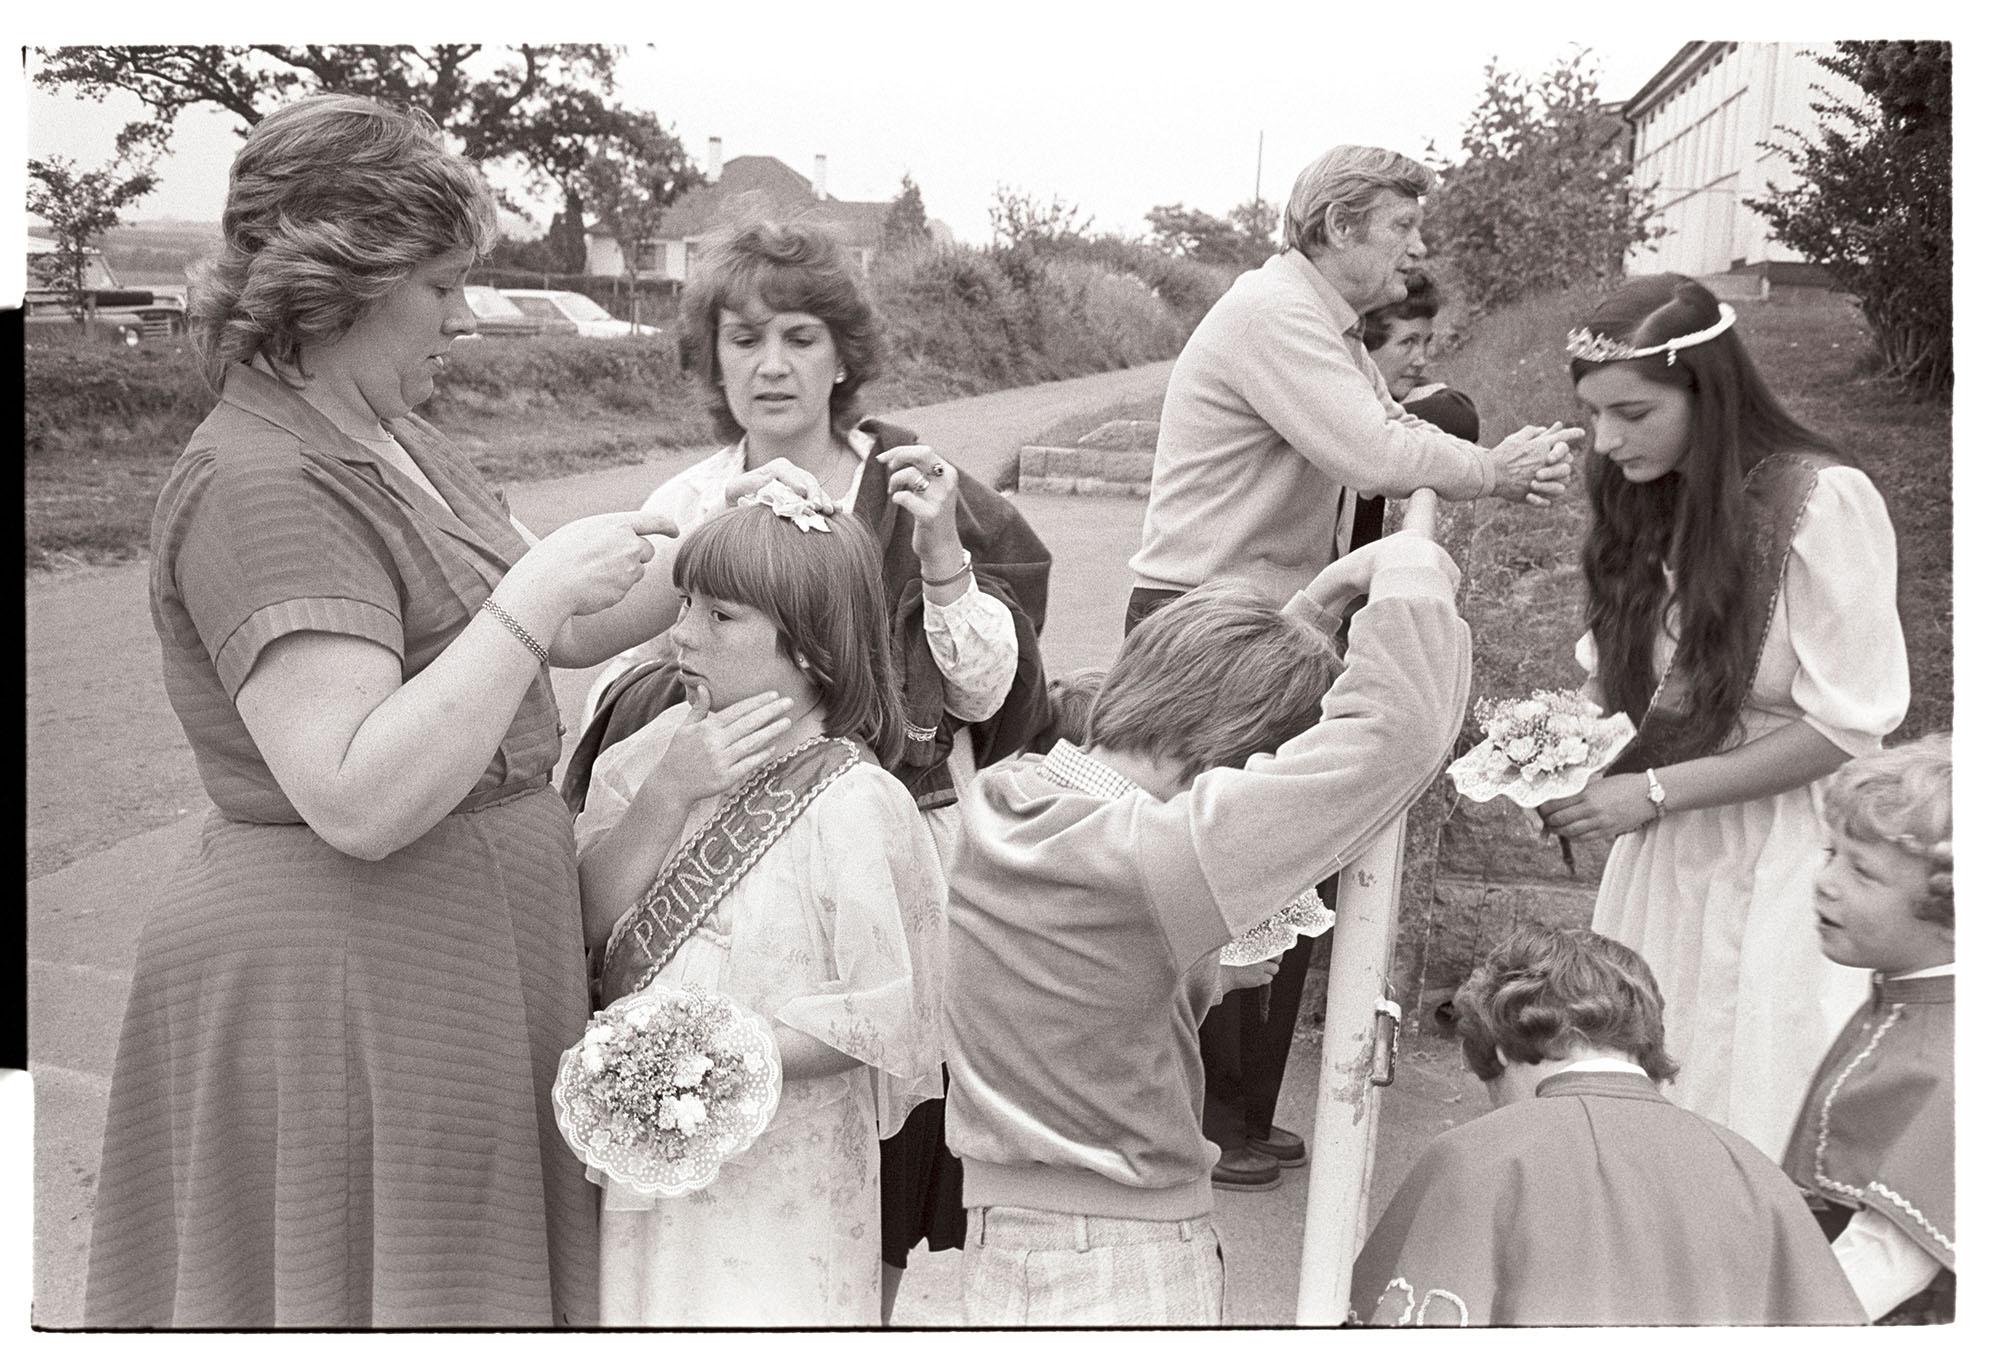 Fair Queen and attendants preparing for parade through village. <br /> [Chulmleigh Fair Queen, Fair Princess and attendants getting ready for the parade through the town at Chulmleigh Fair. A woman is preparing one of the princess's hair.]